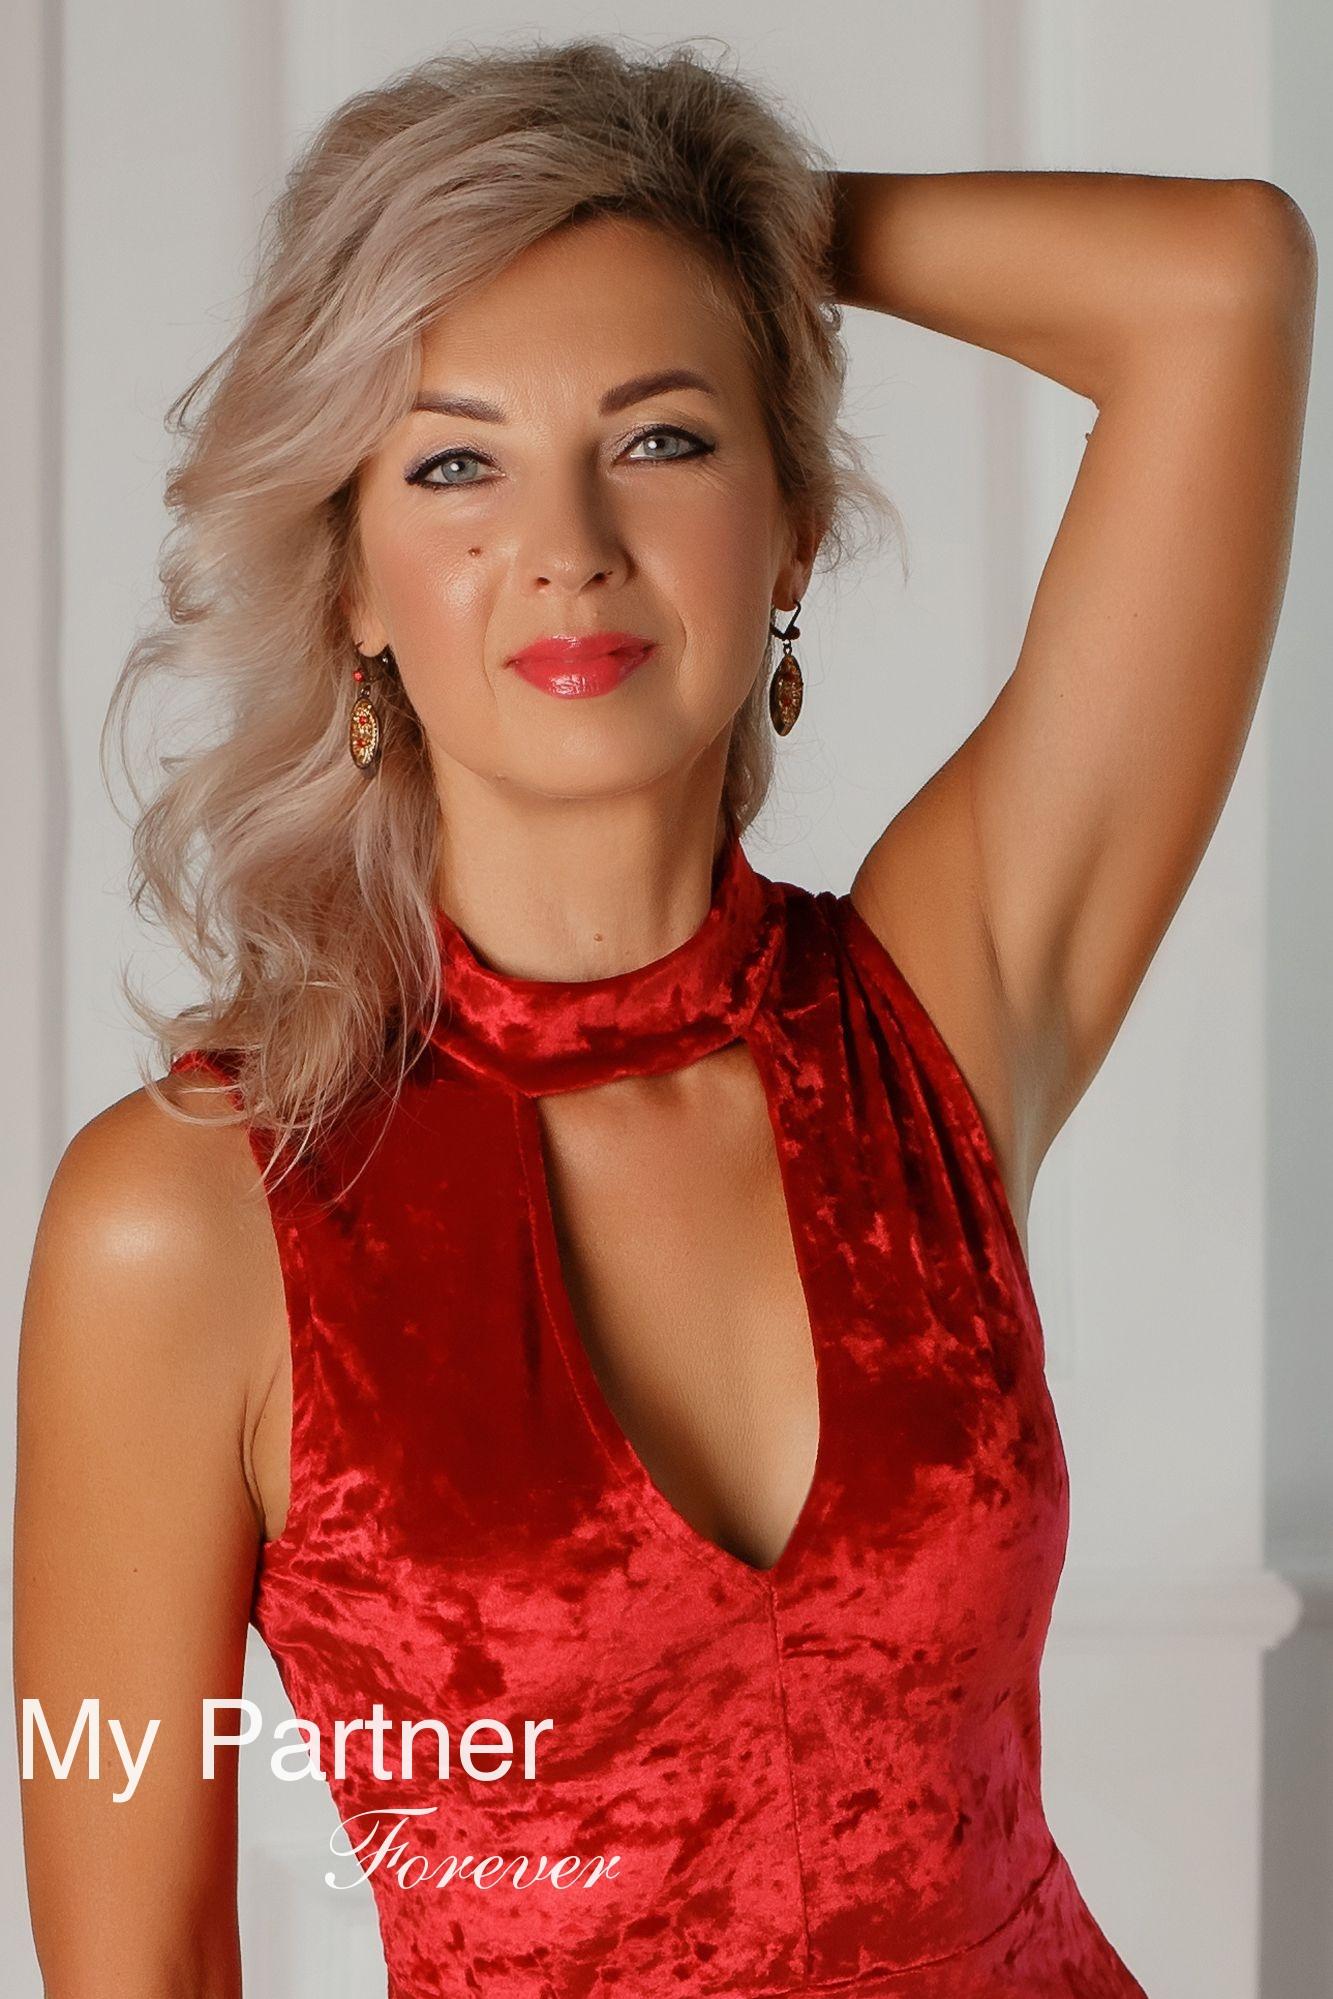 Gorgeous Ukrainian Girl Tatiyana from Dniepropetrovsk, Ukraine